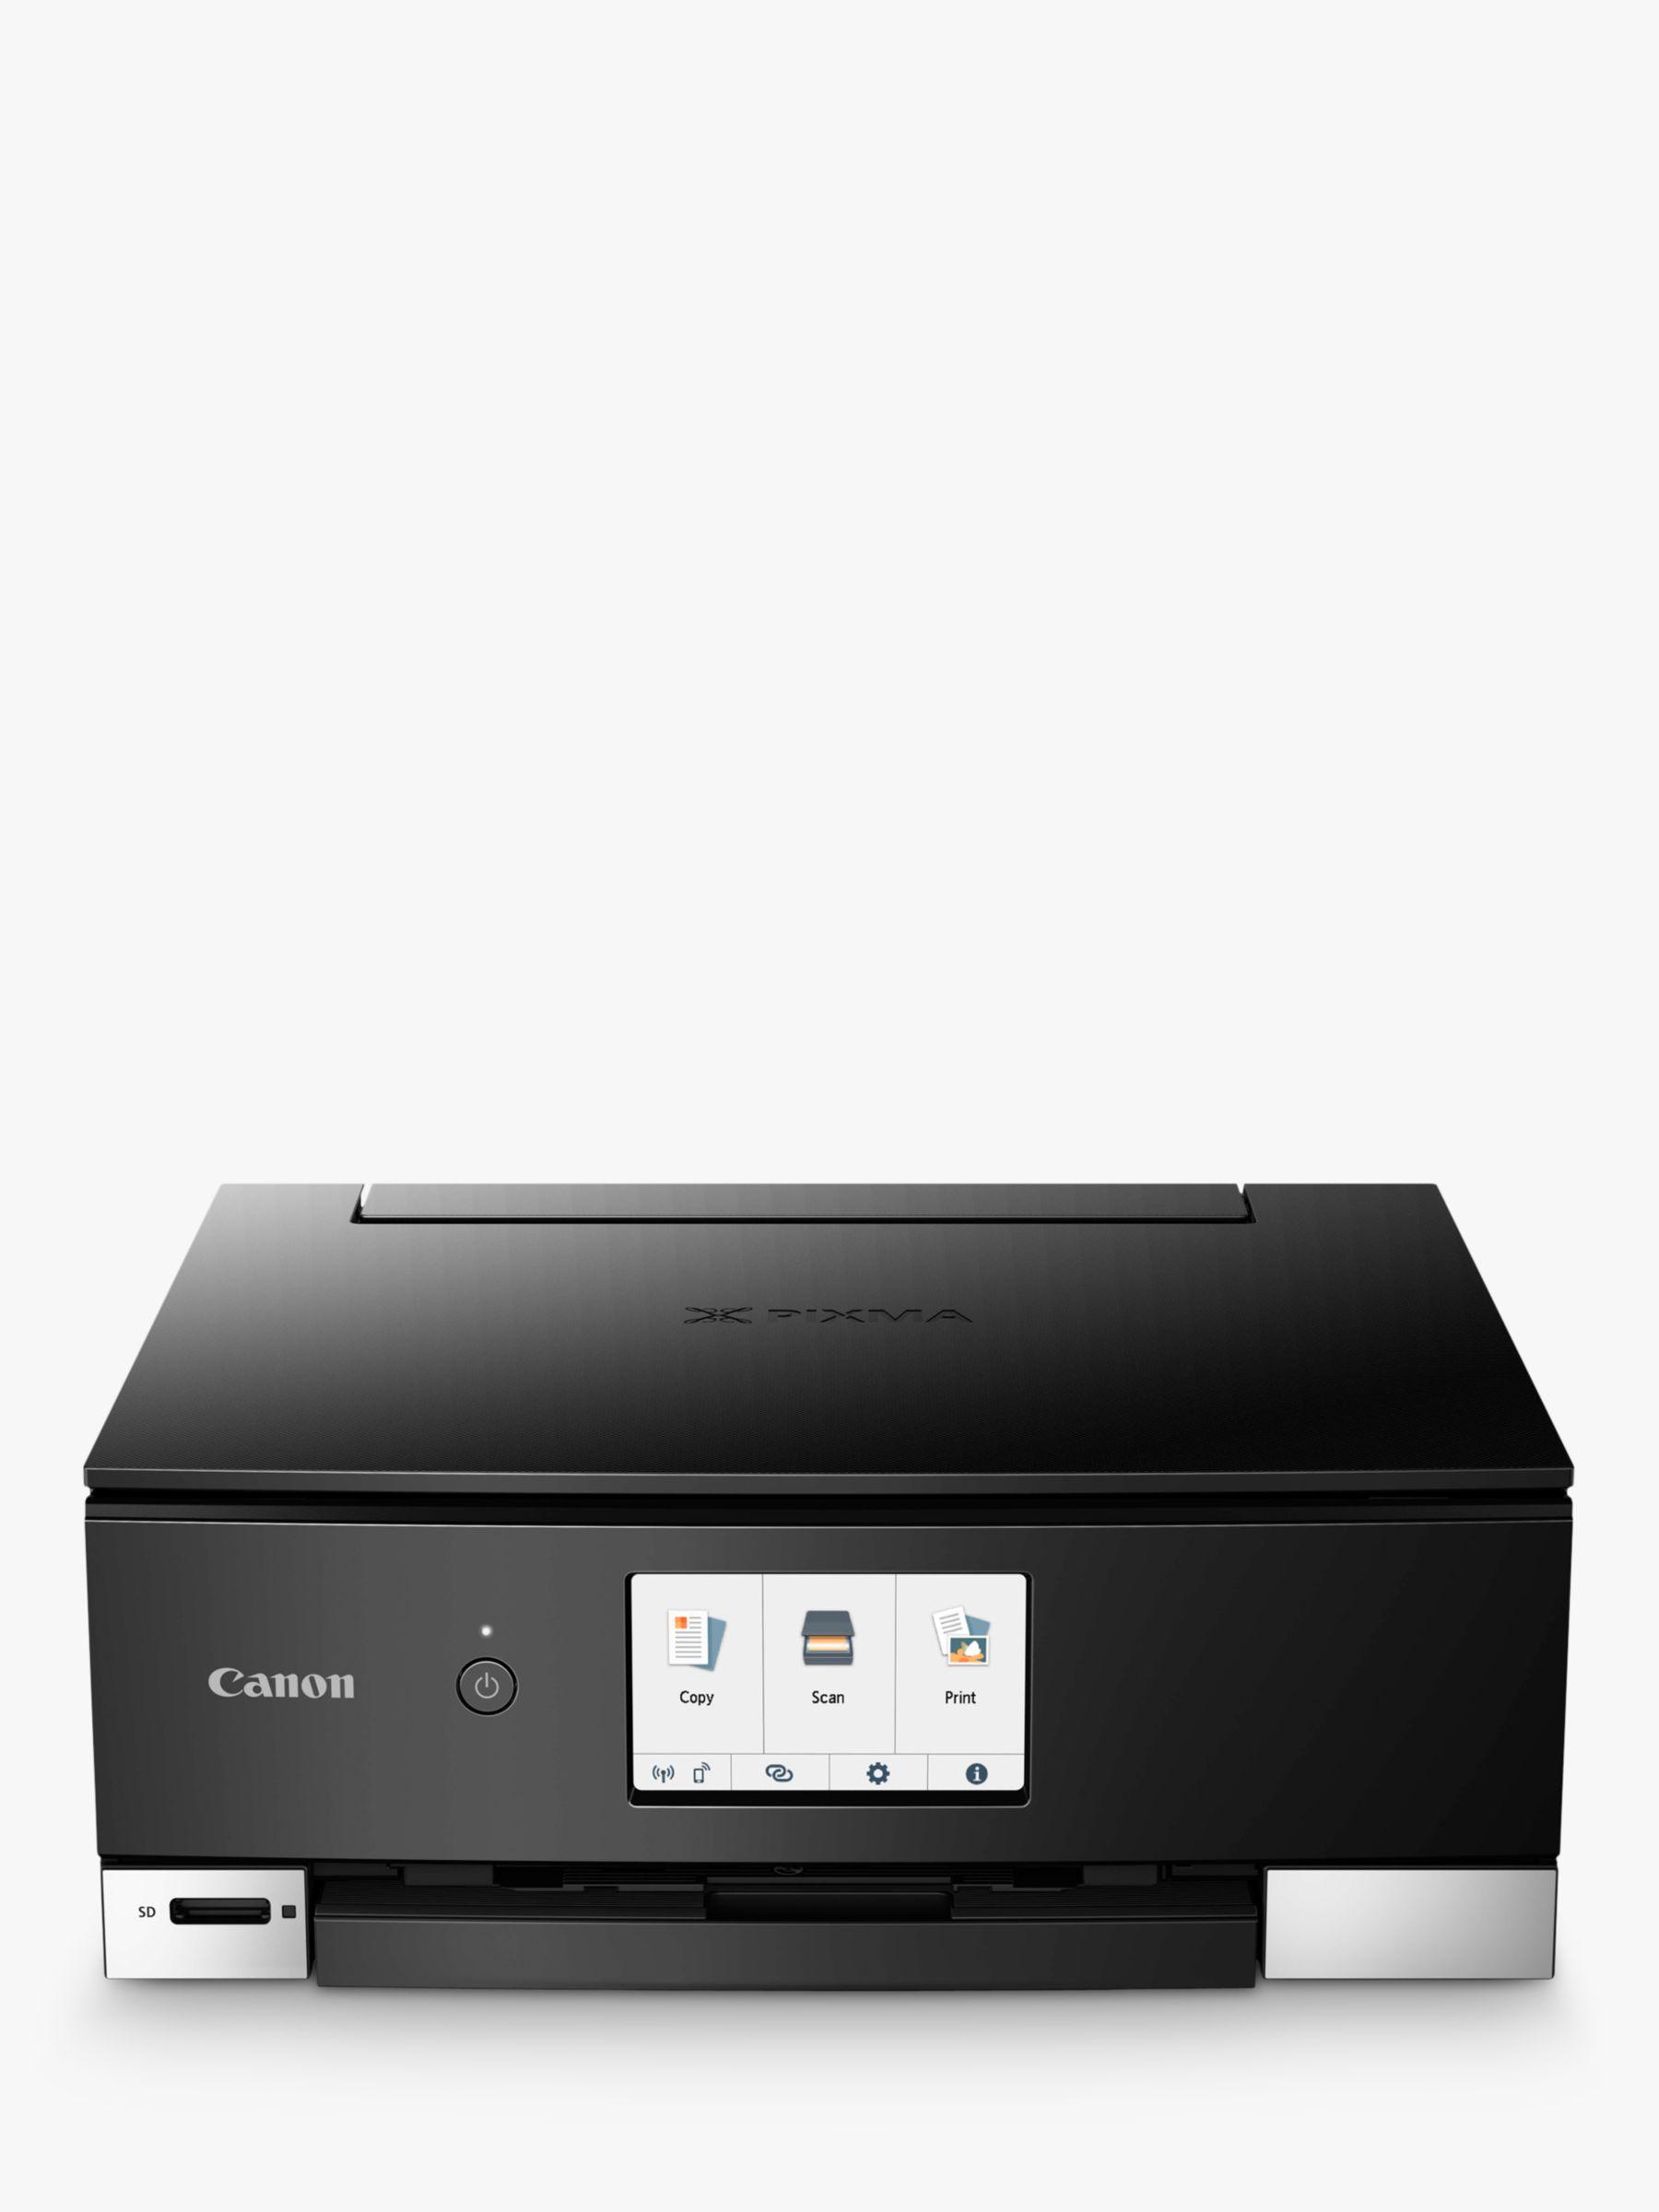 Canon Canon PIXMA TS8350 Three-in-One Wireless Wi-Fi Printer with Auto-Tilting Touch Screen, Black